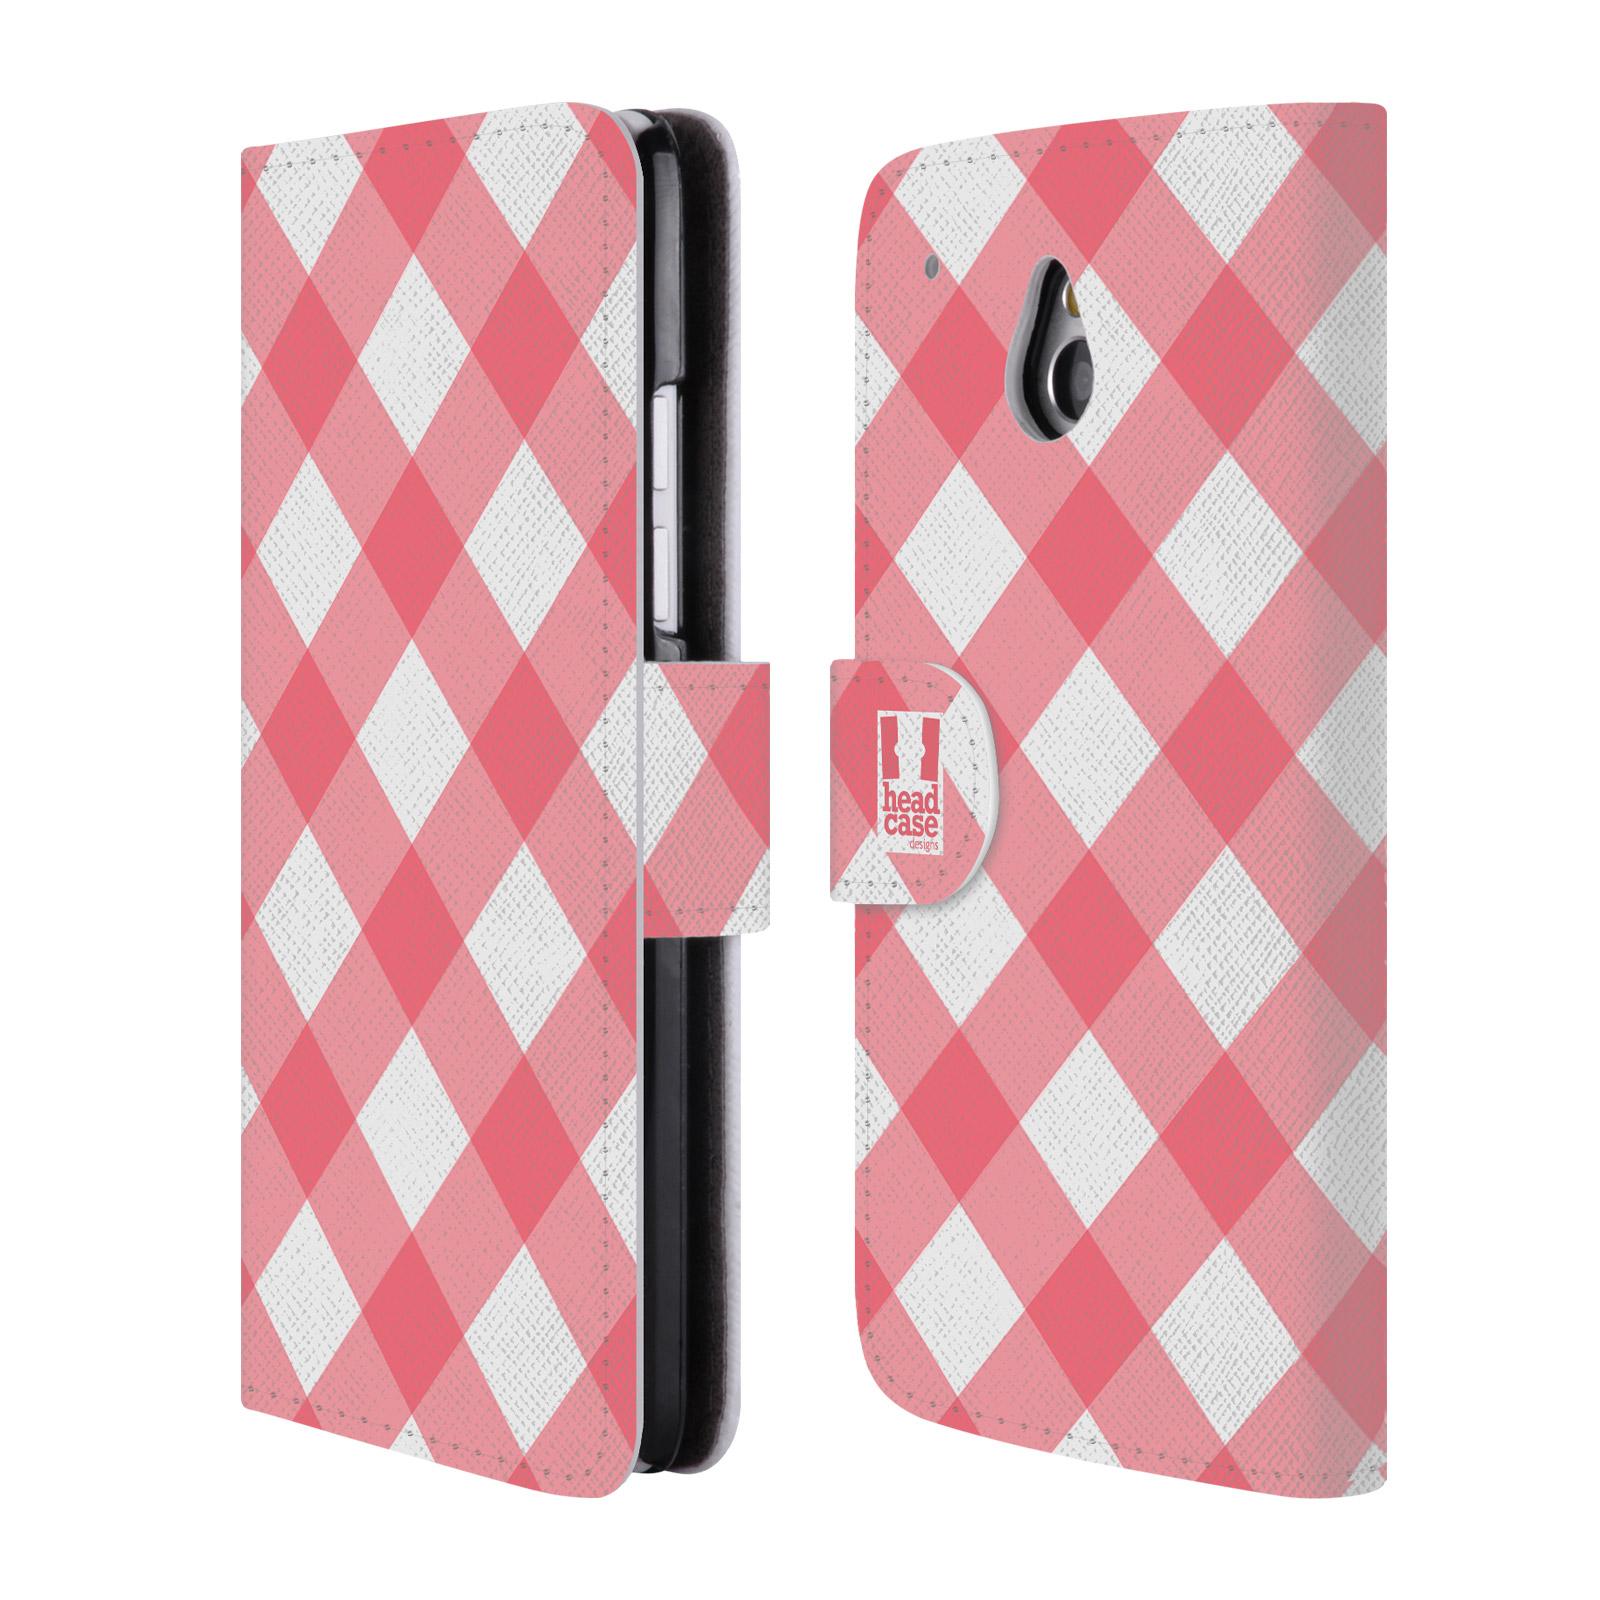 HEAD CASE Flipové pouzdro pro mobil HTC ONE MINI (M4) Francouzský venkov piknik růžová